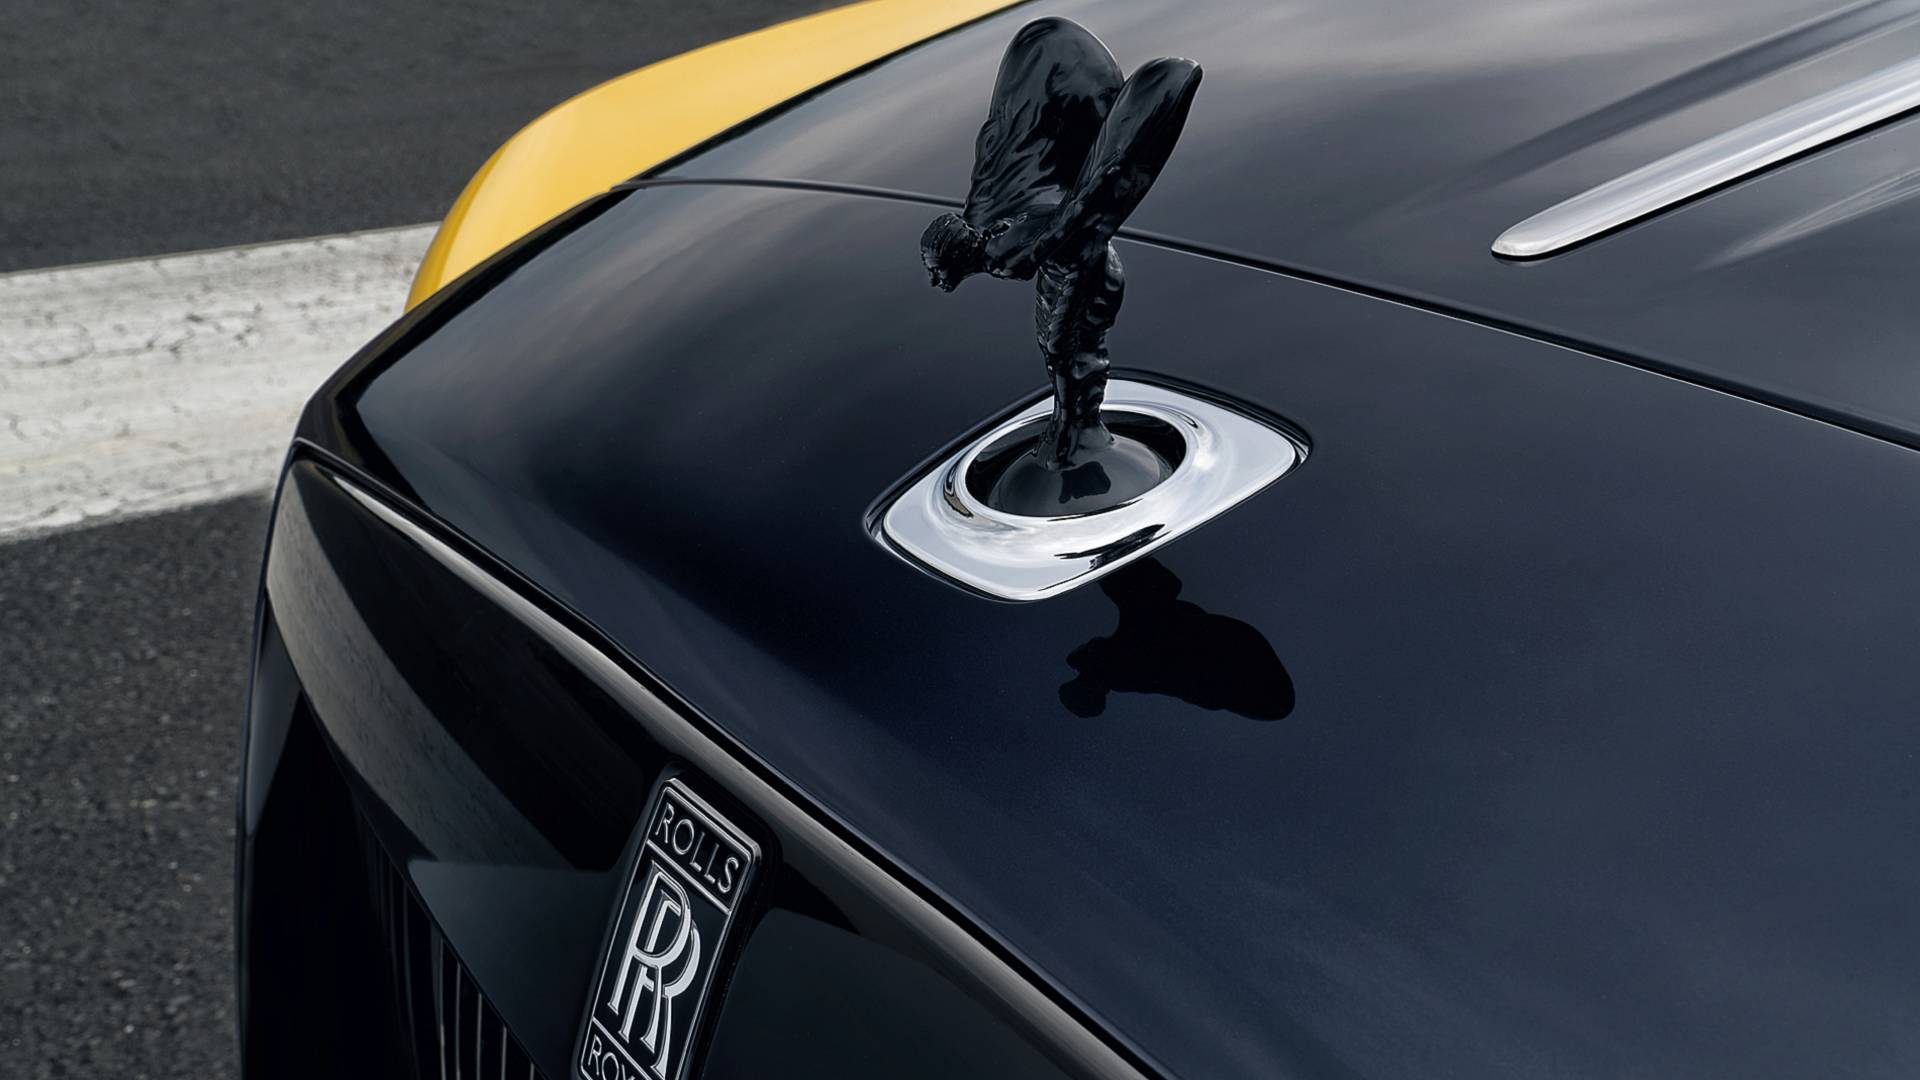 rolls-royce-dawn-black-badge-5.jpg